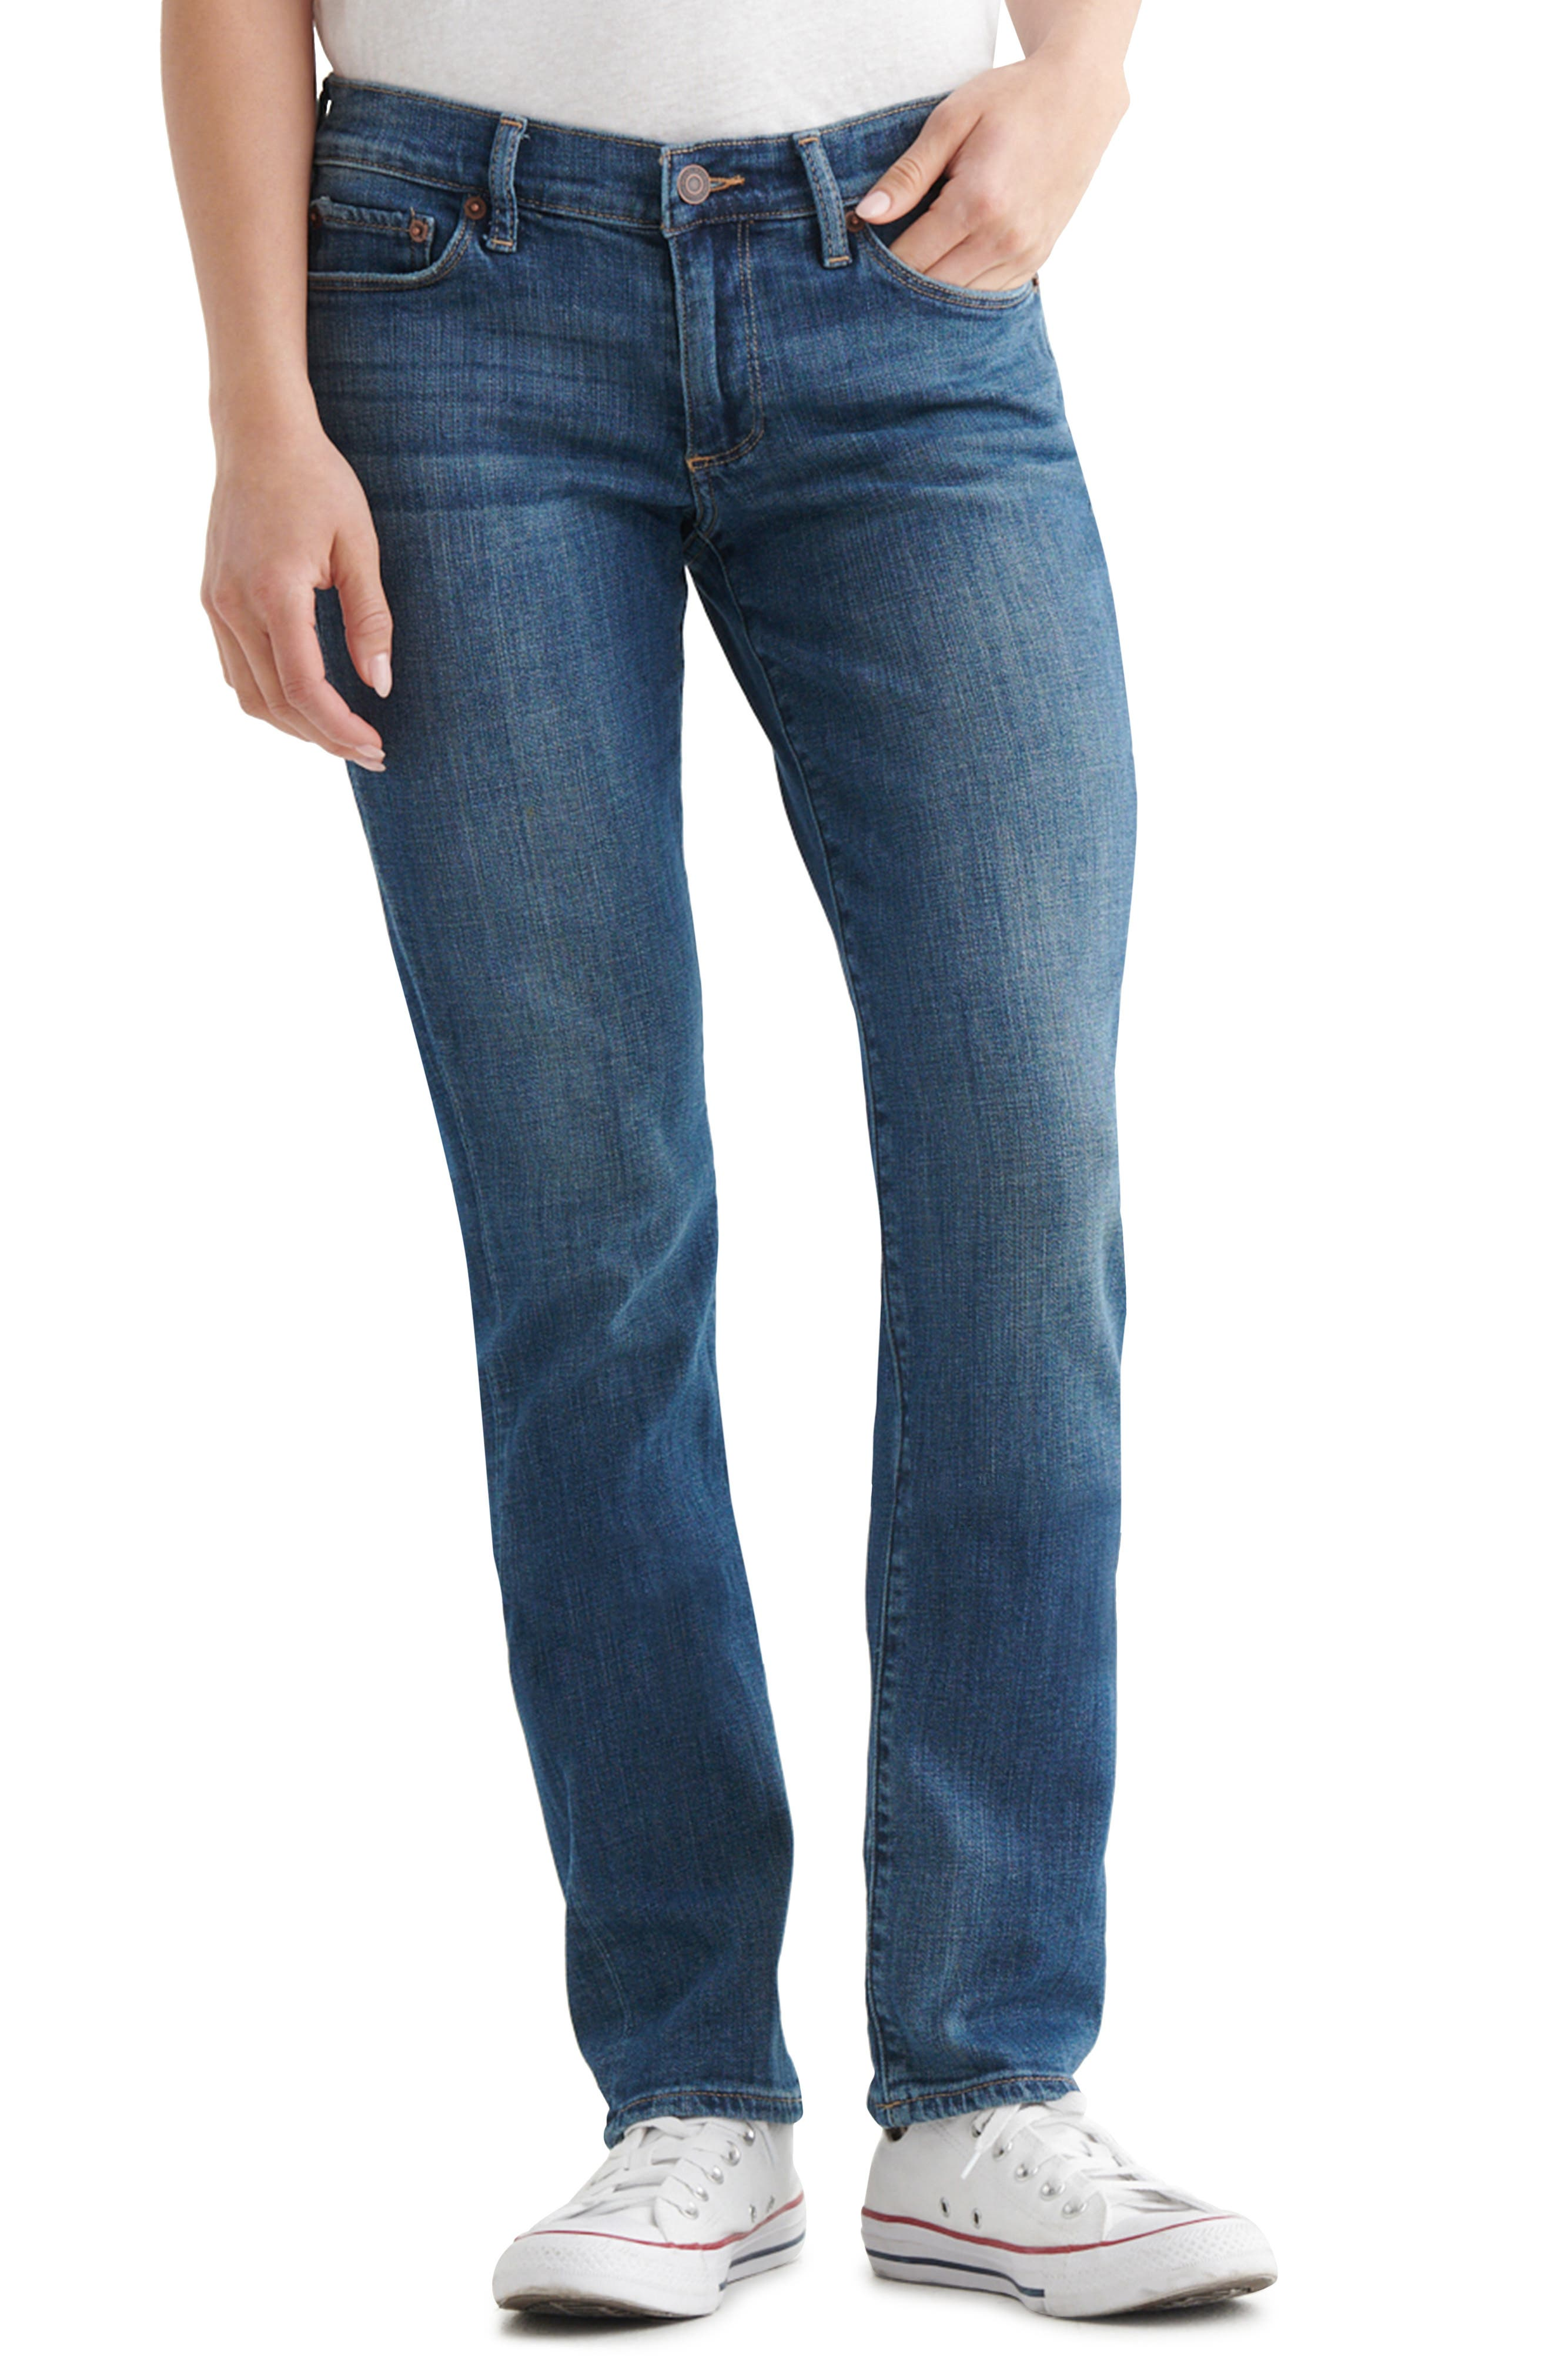 'Sweet 'N' Straight' Stretch Straight Leg Jeans